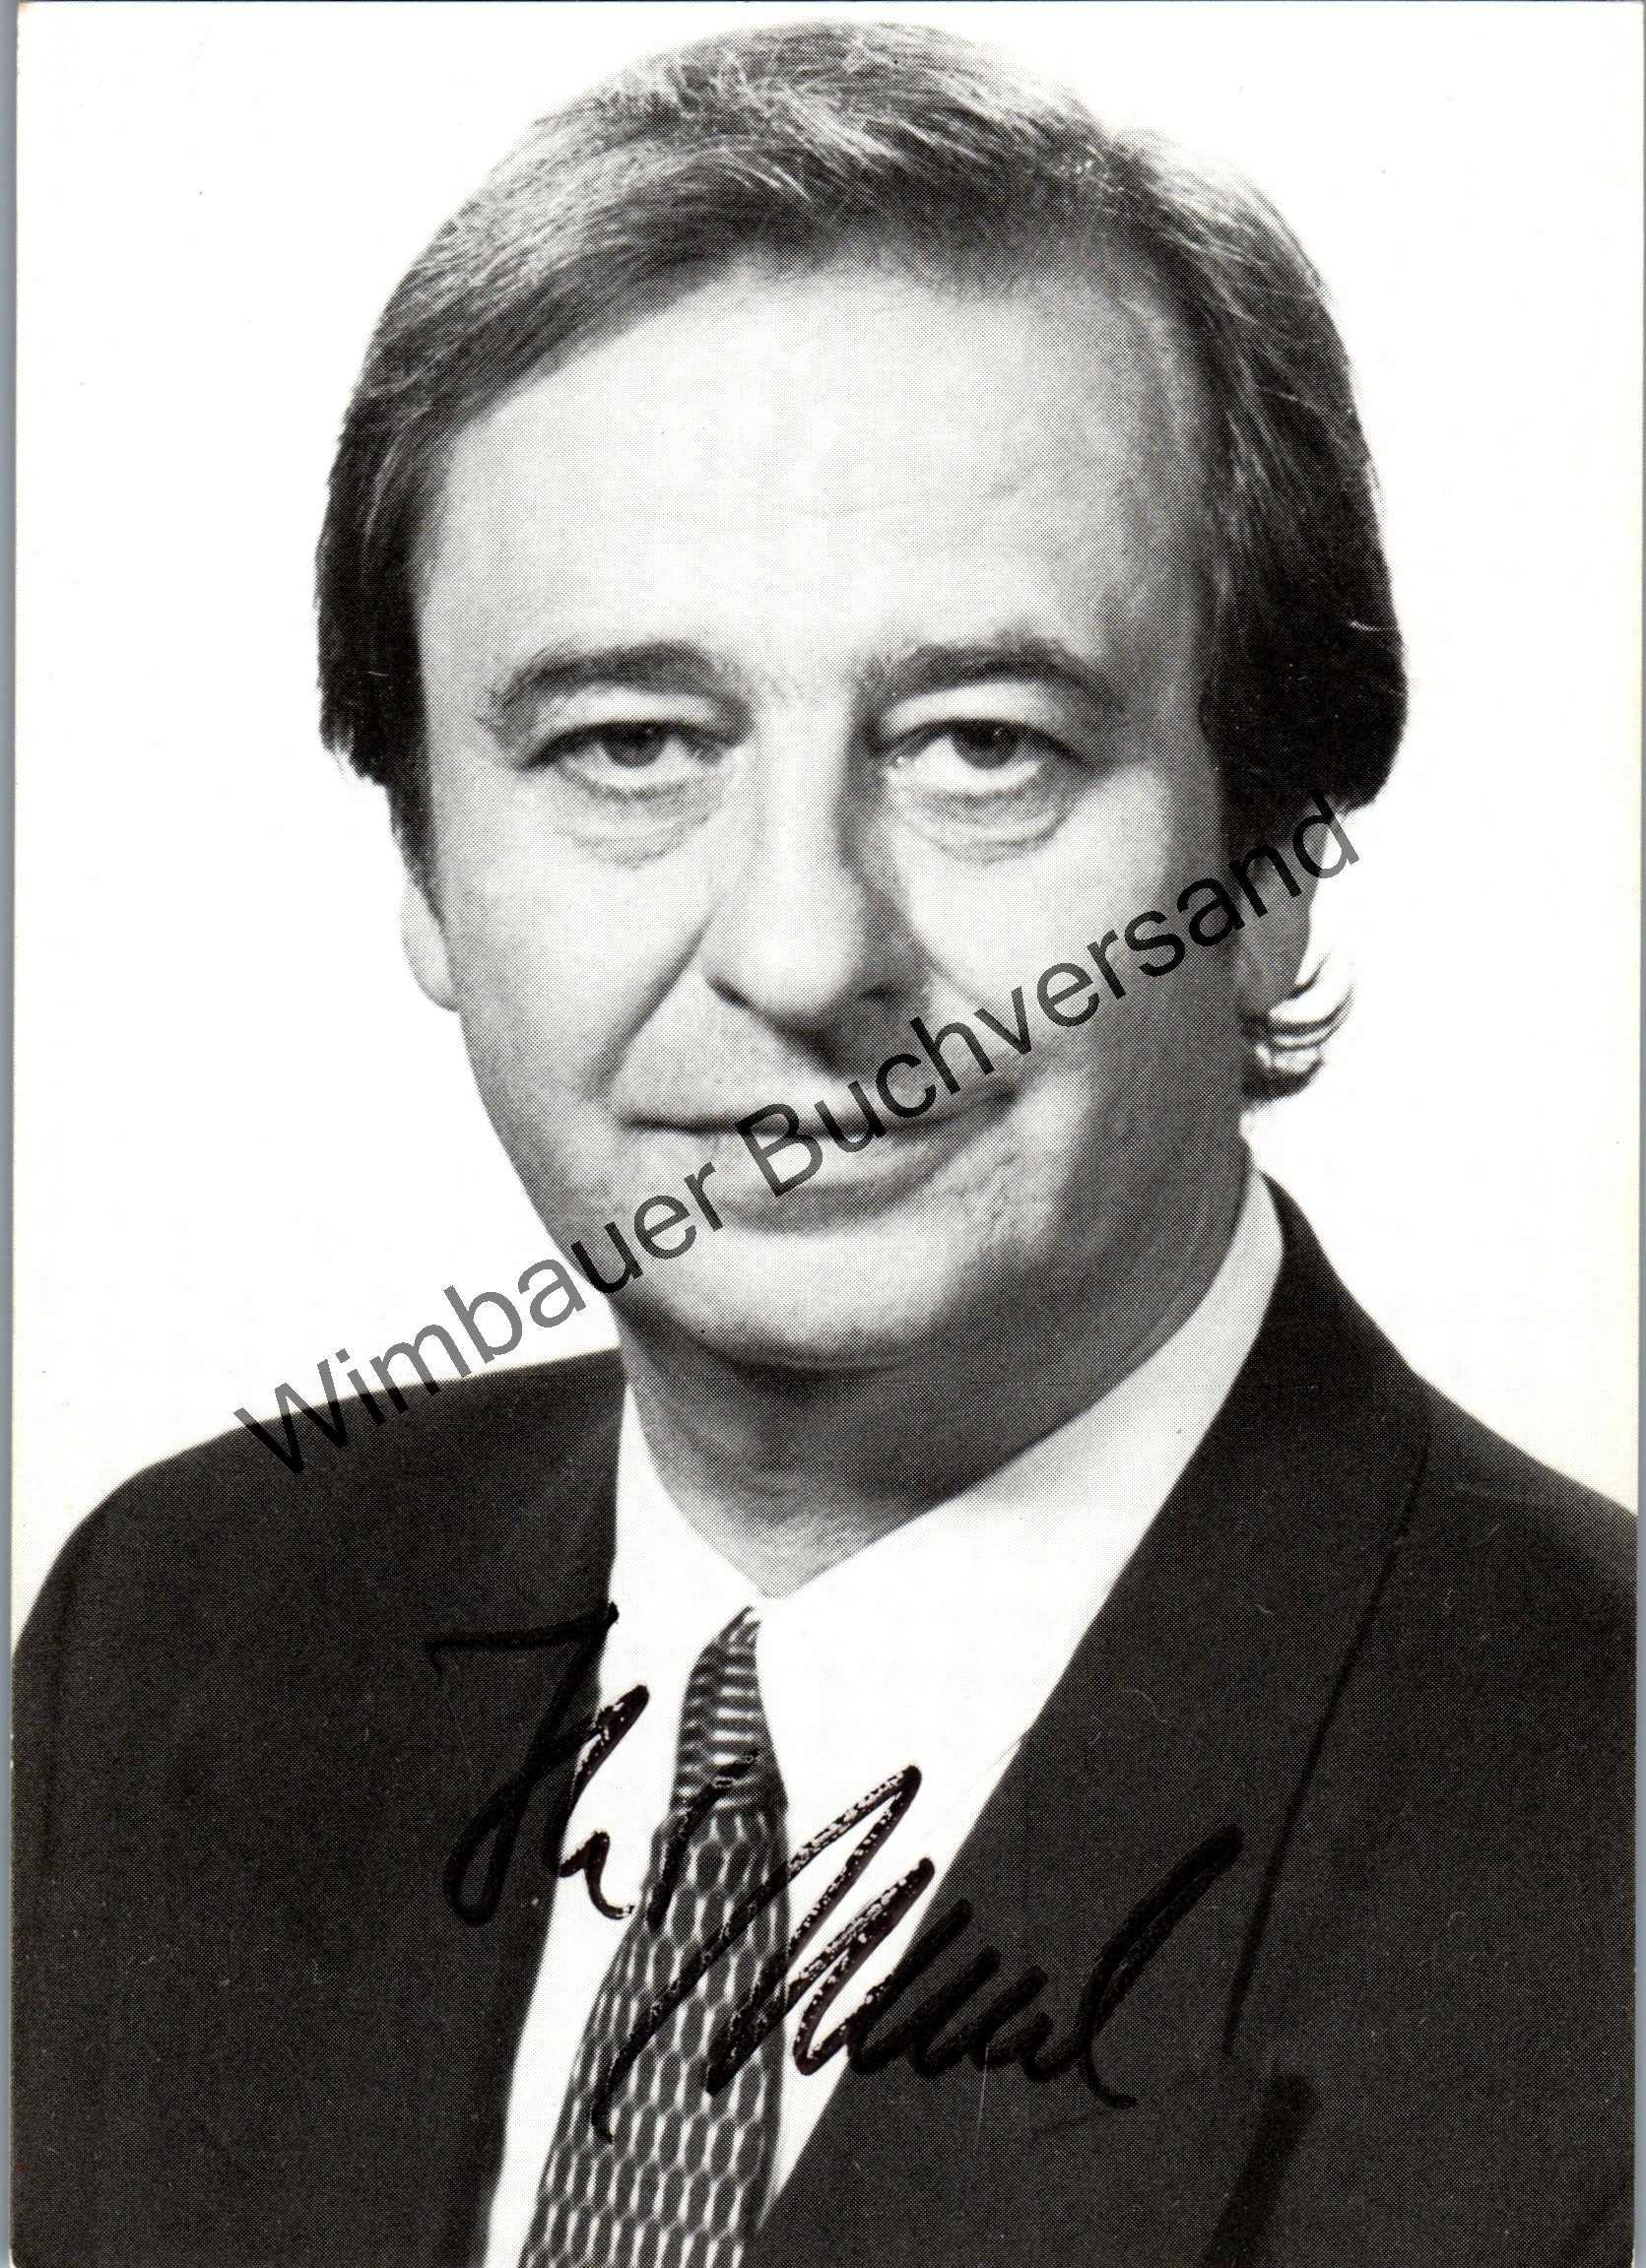 Original Autogramm Kurt Stenzel (1938-2012) SDR /// Autograph signiert signed signee